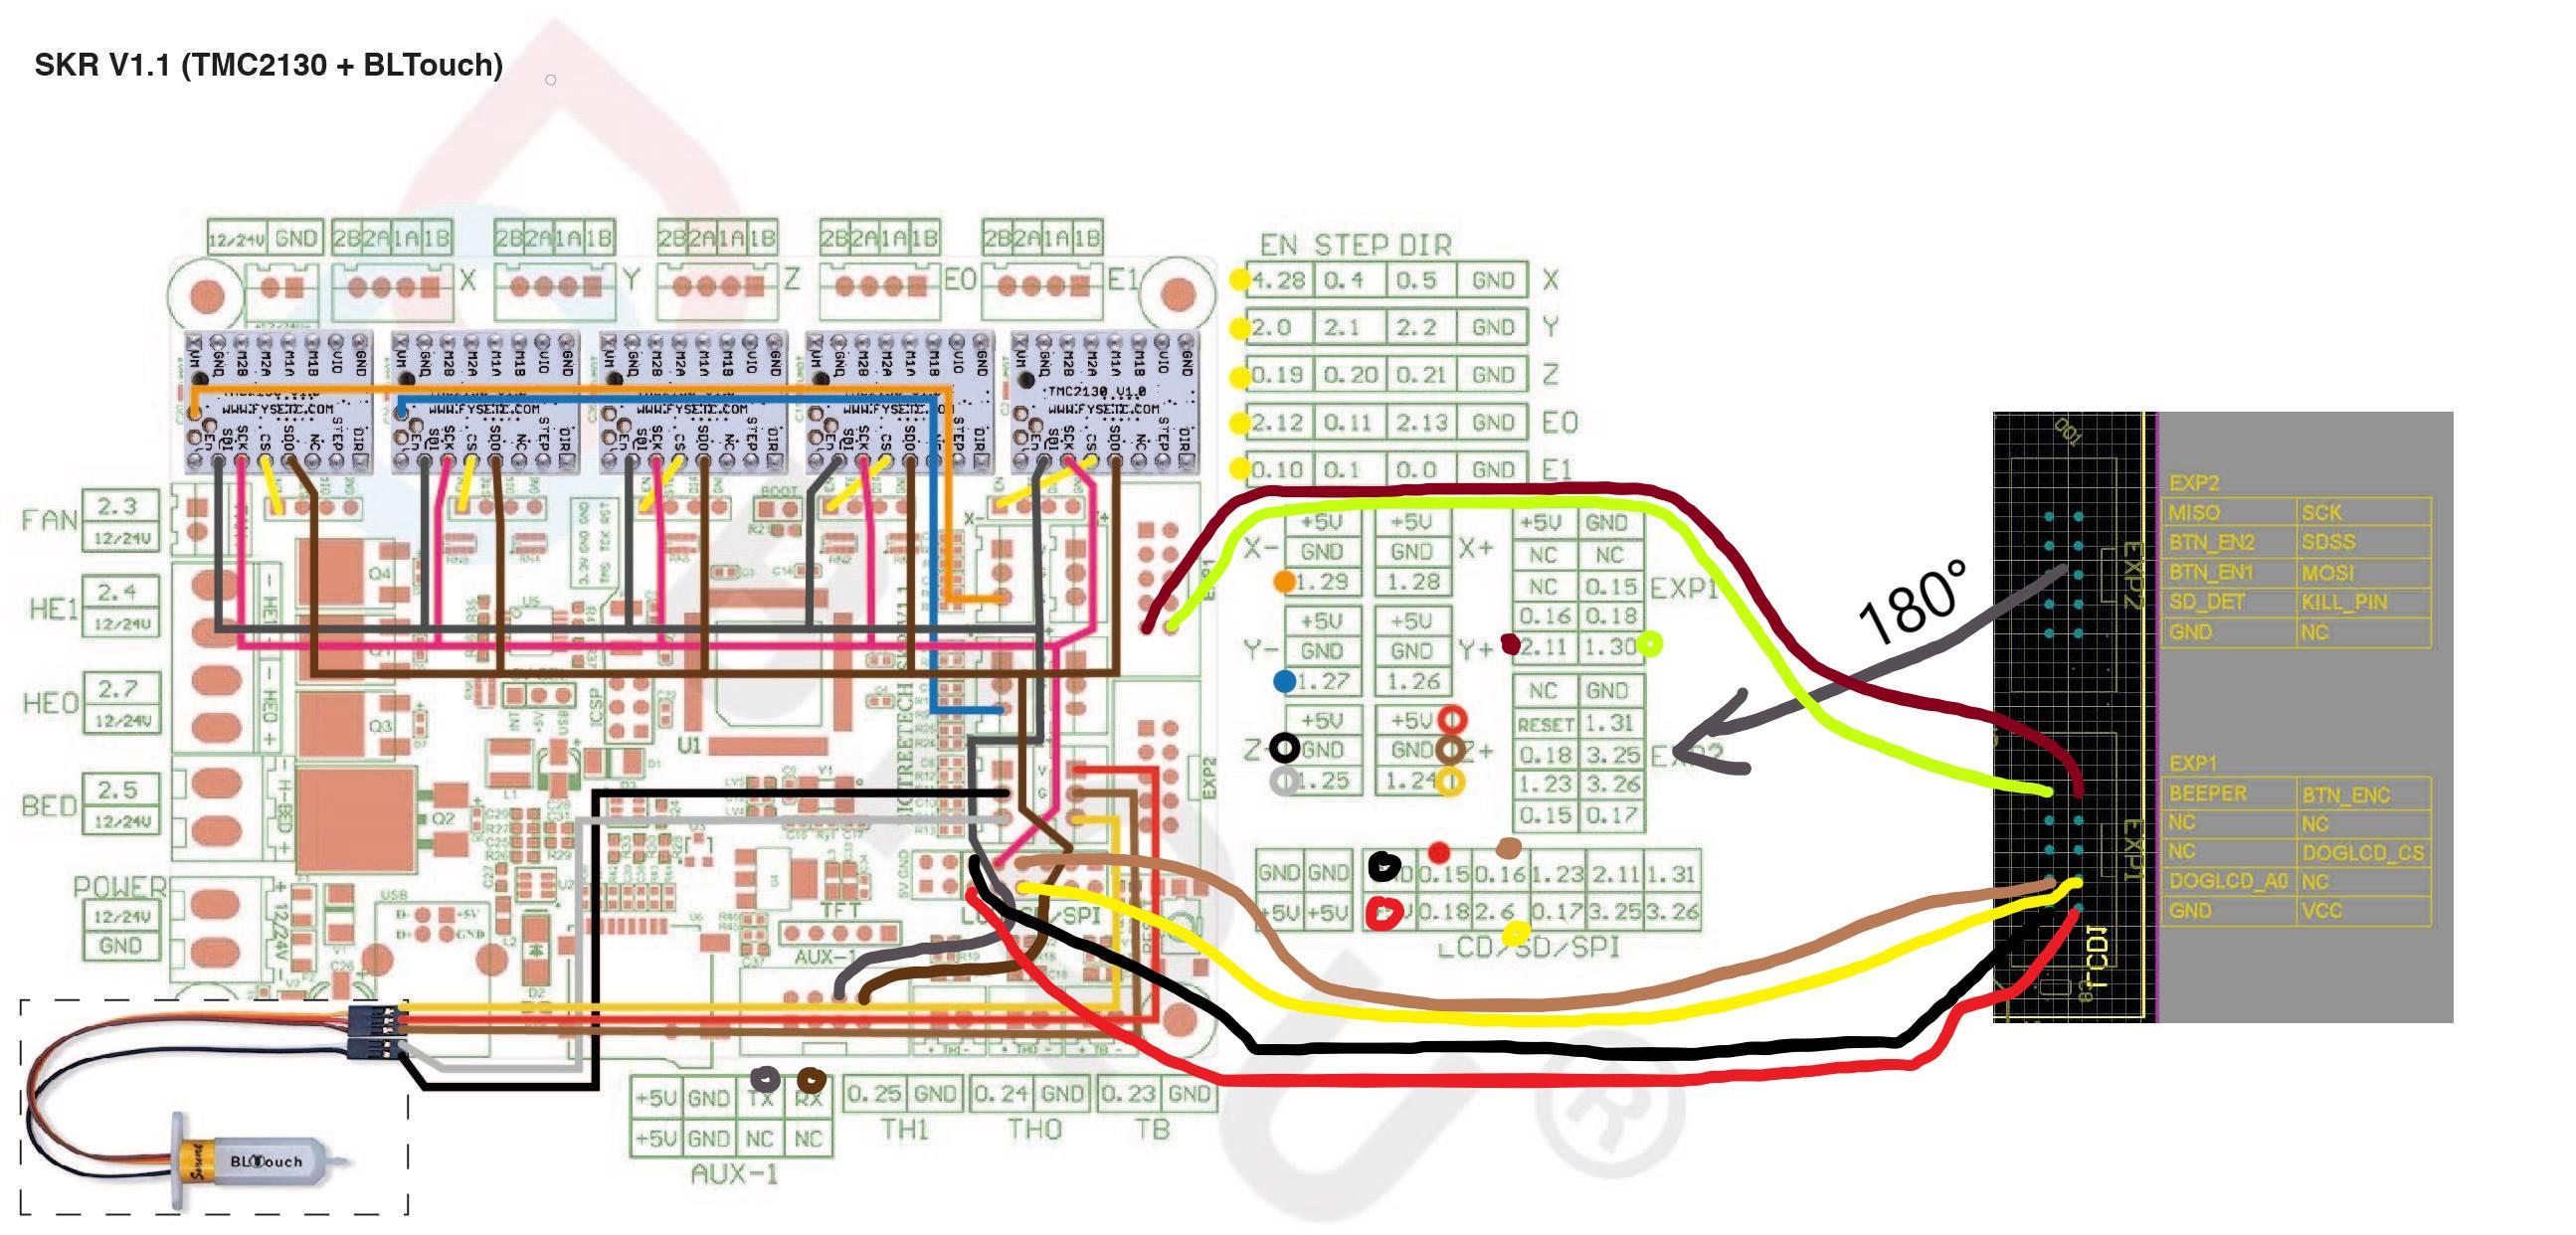 Bigtreetrech Skr V11 32bit Lpc1768 Mcu Issue 12632 Motherboard Diagram With Labels Quotes Dsbuffer